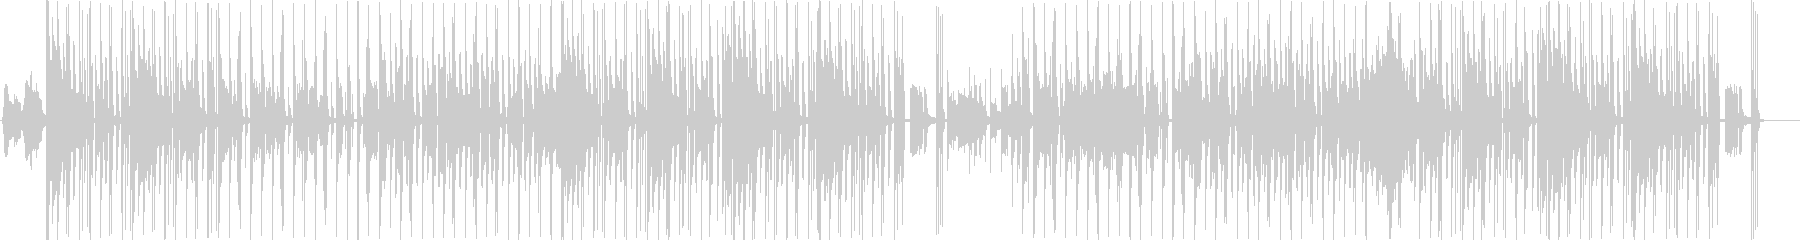 PV】カートゥーンっぽいコミカルなジャズの未再生の波形